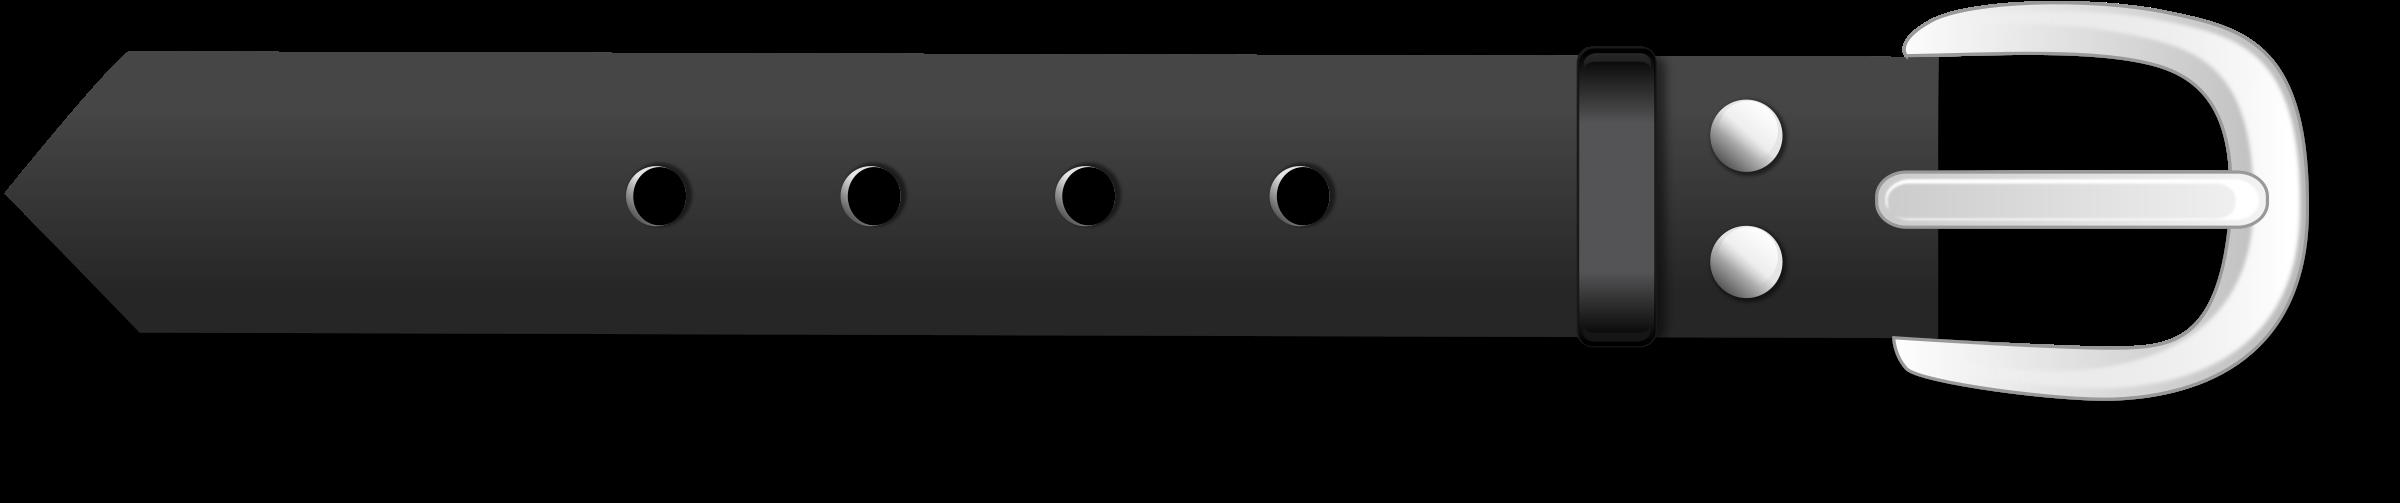 Ремень PNG фото